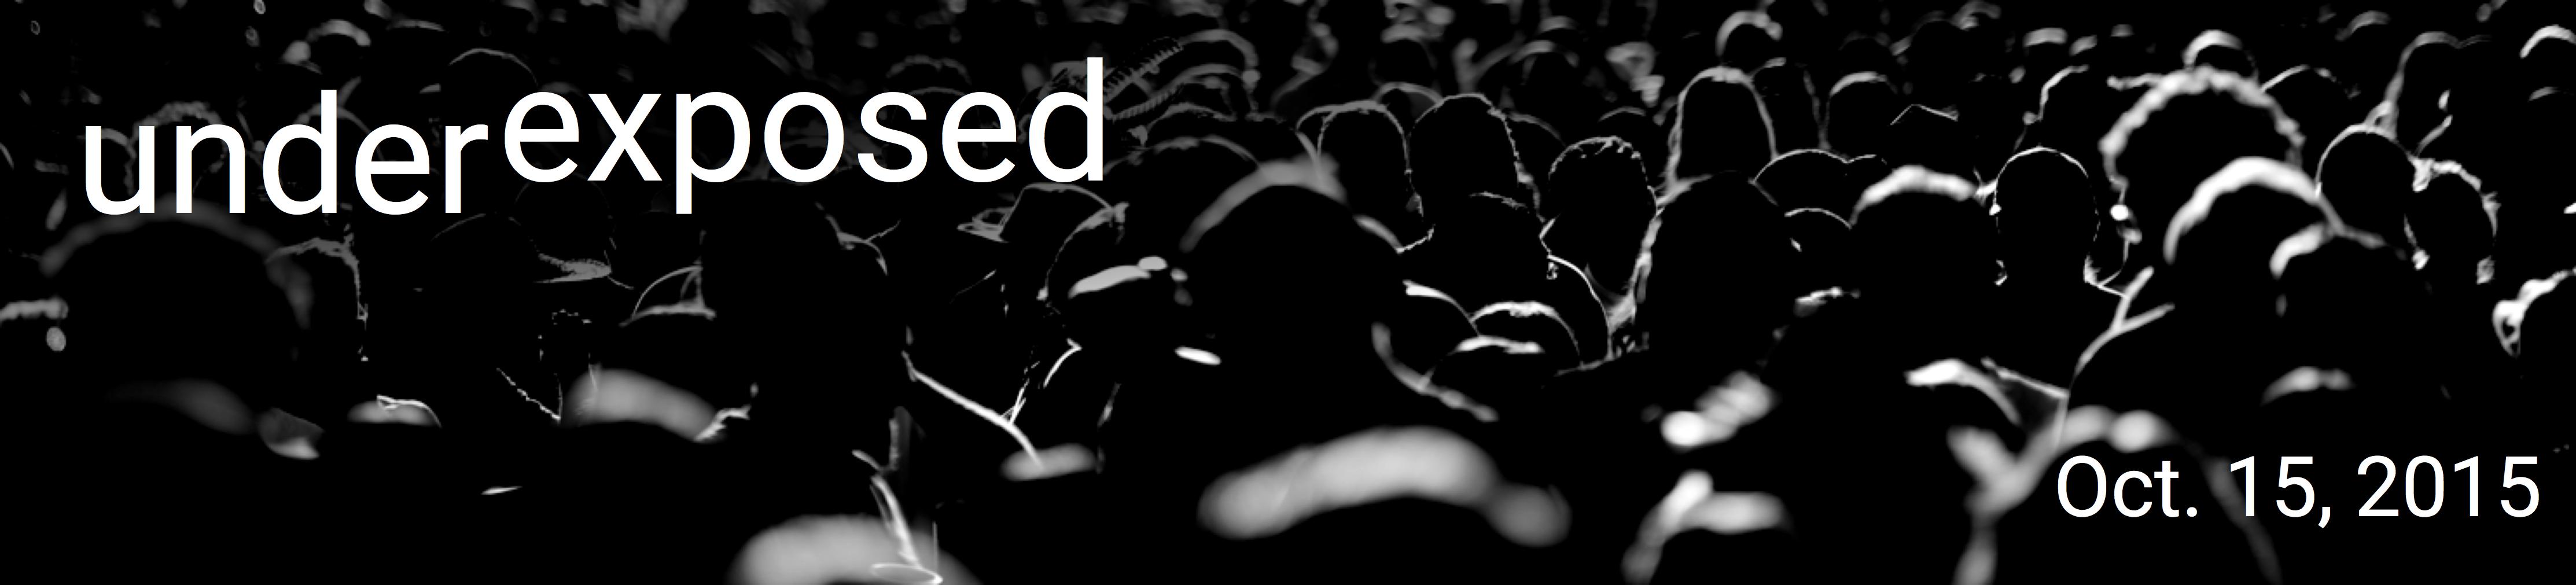 Underexposed Workshop Header Image